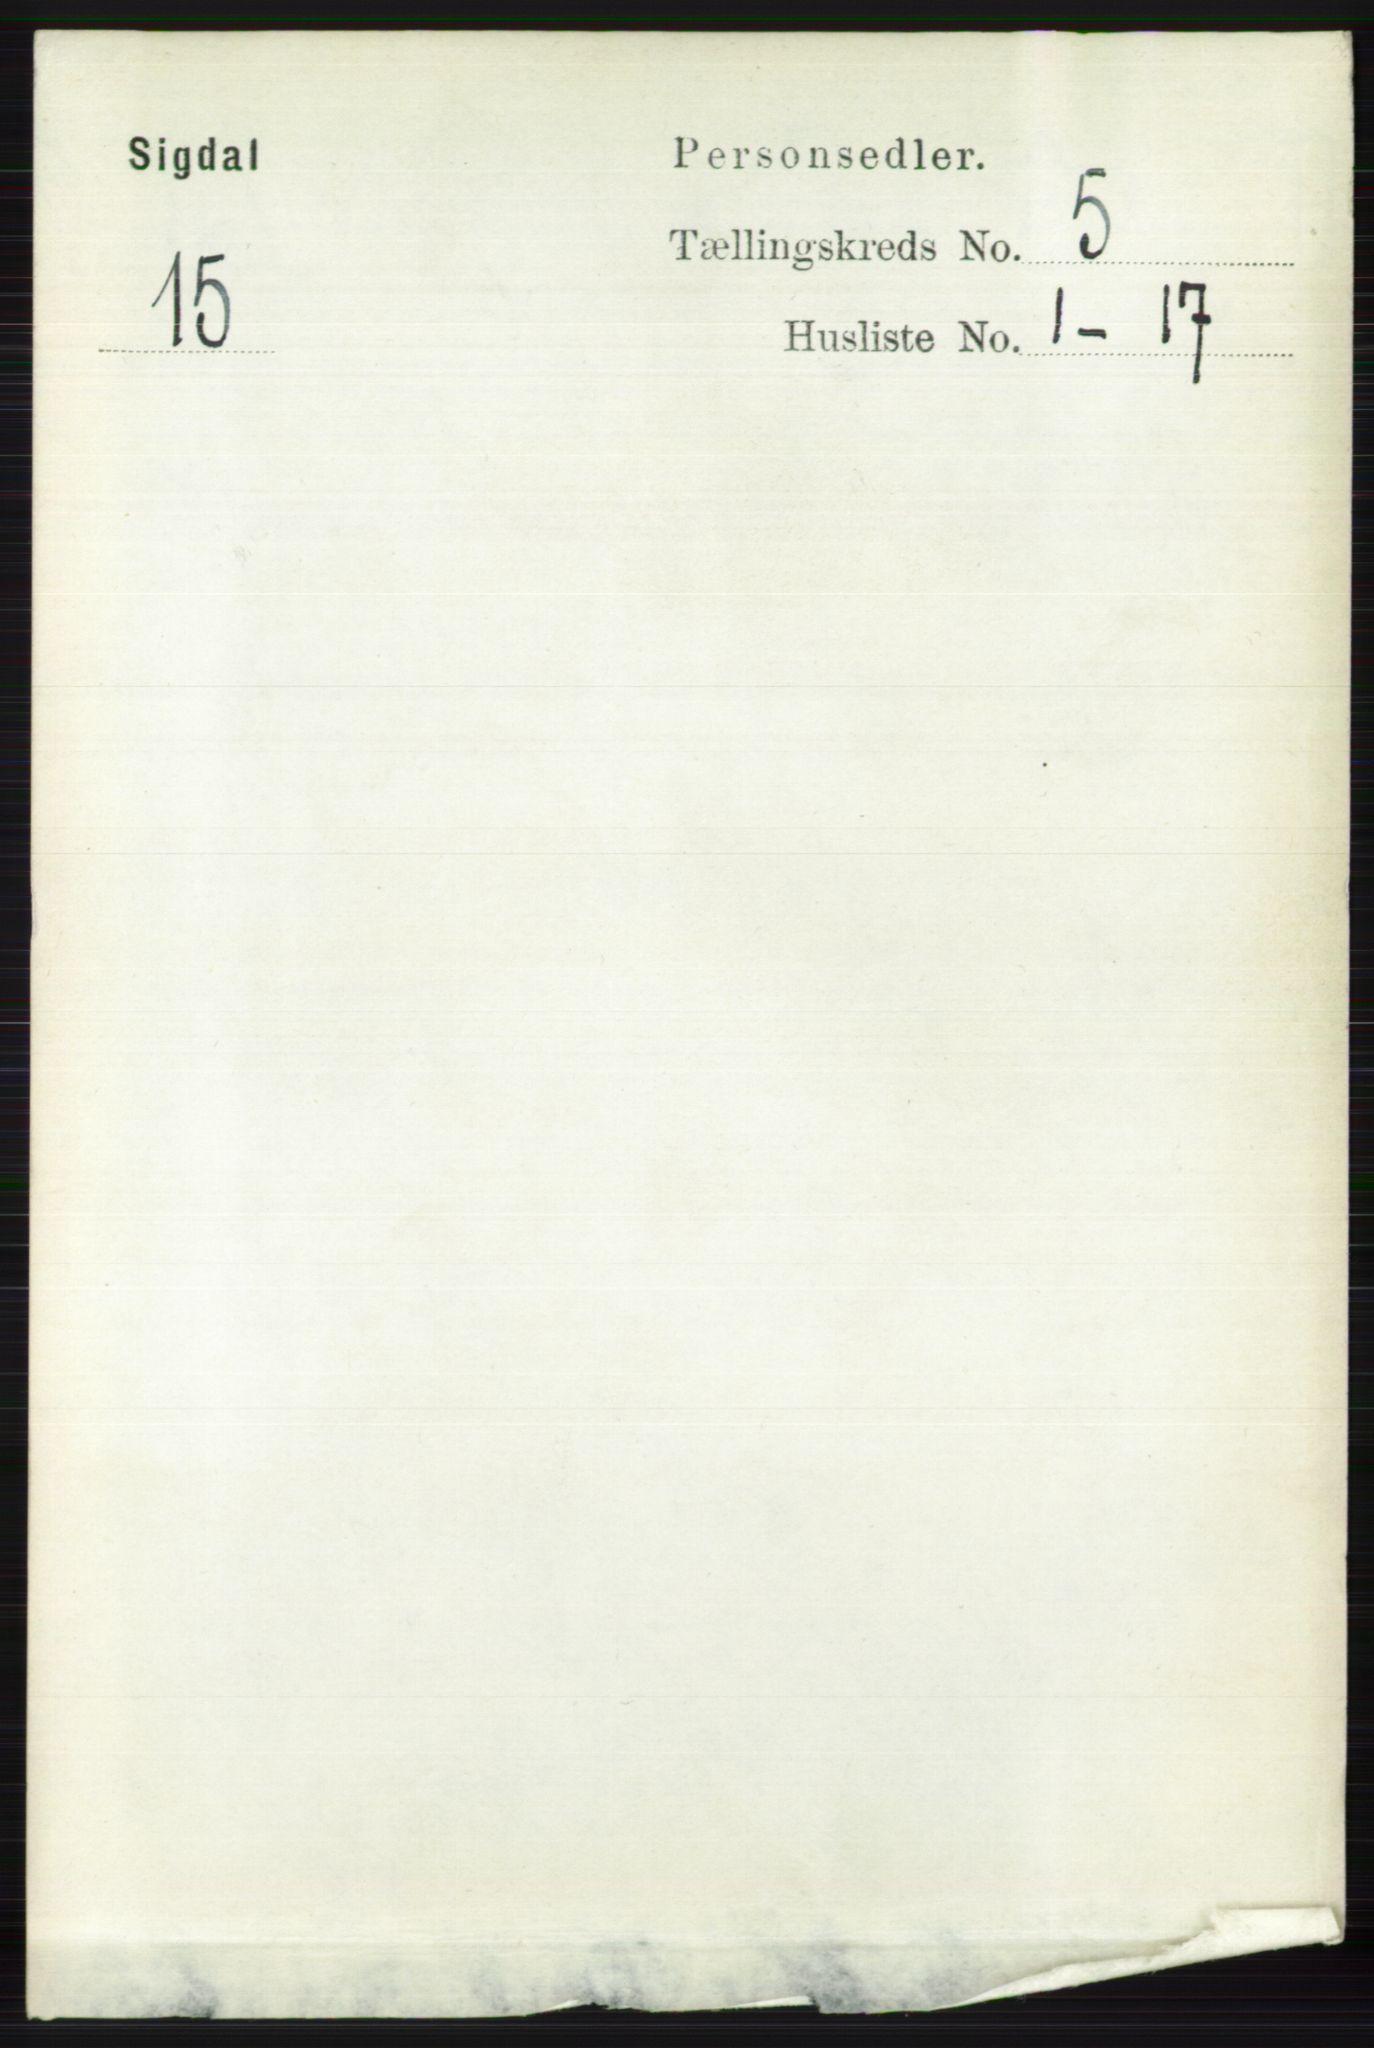 RA, Folketelling 1891 for 0621 Sigdal herred, 1891, s. 1928